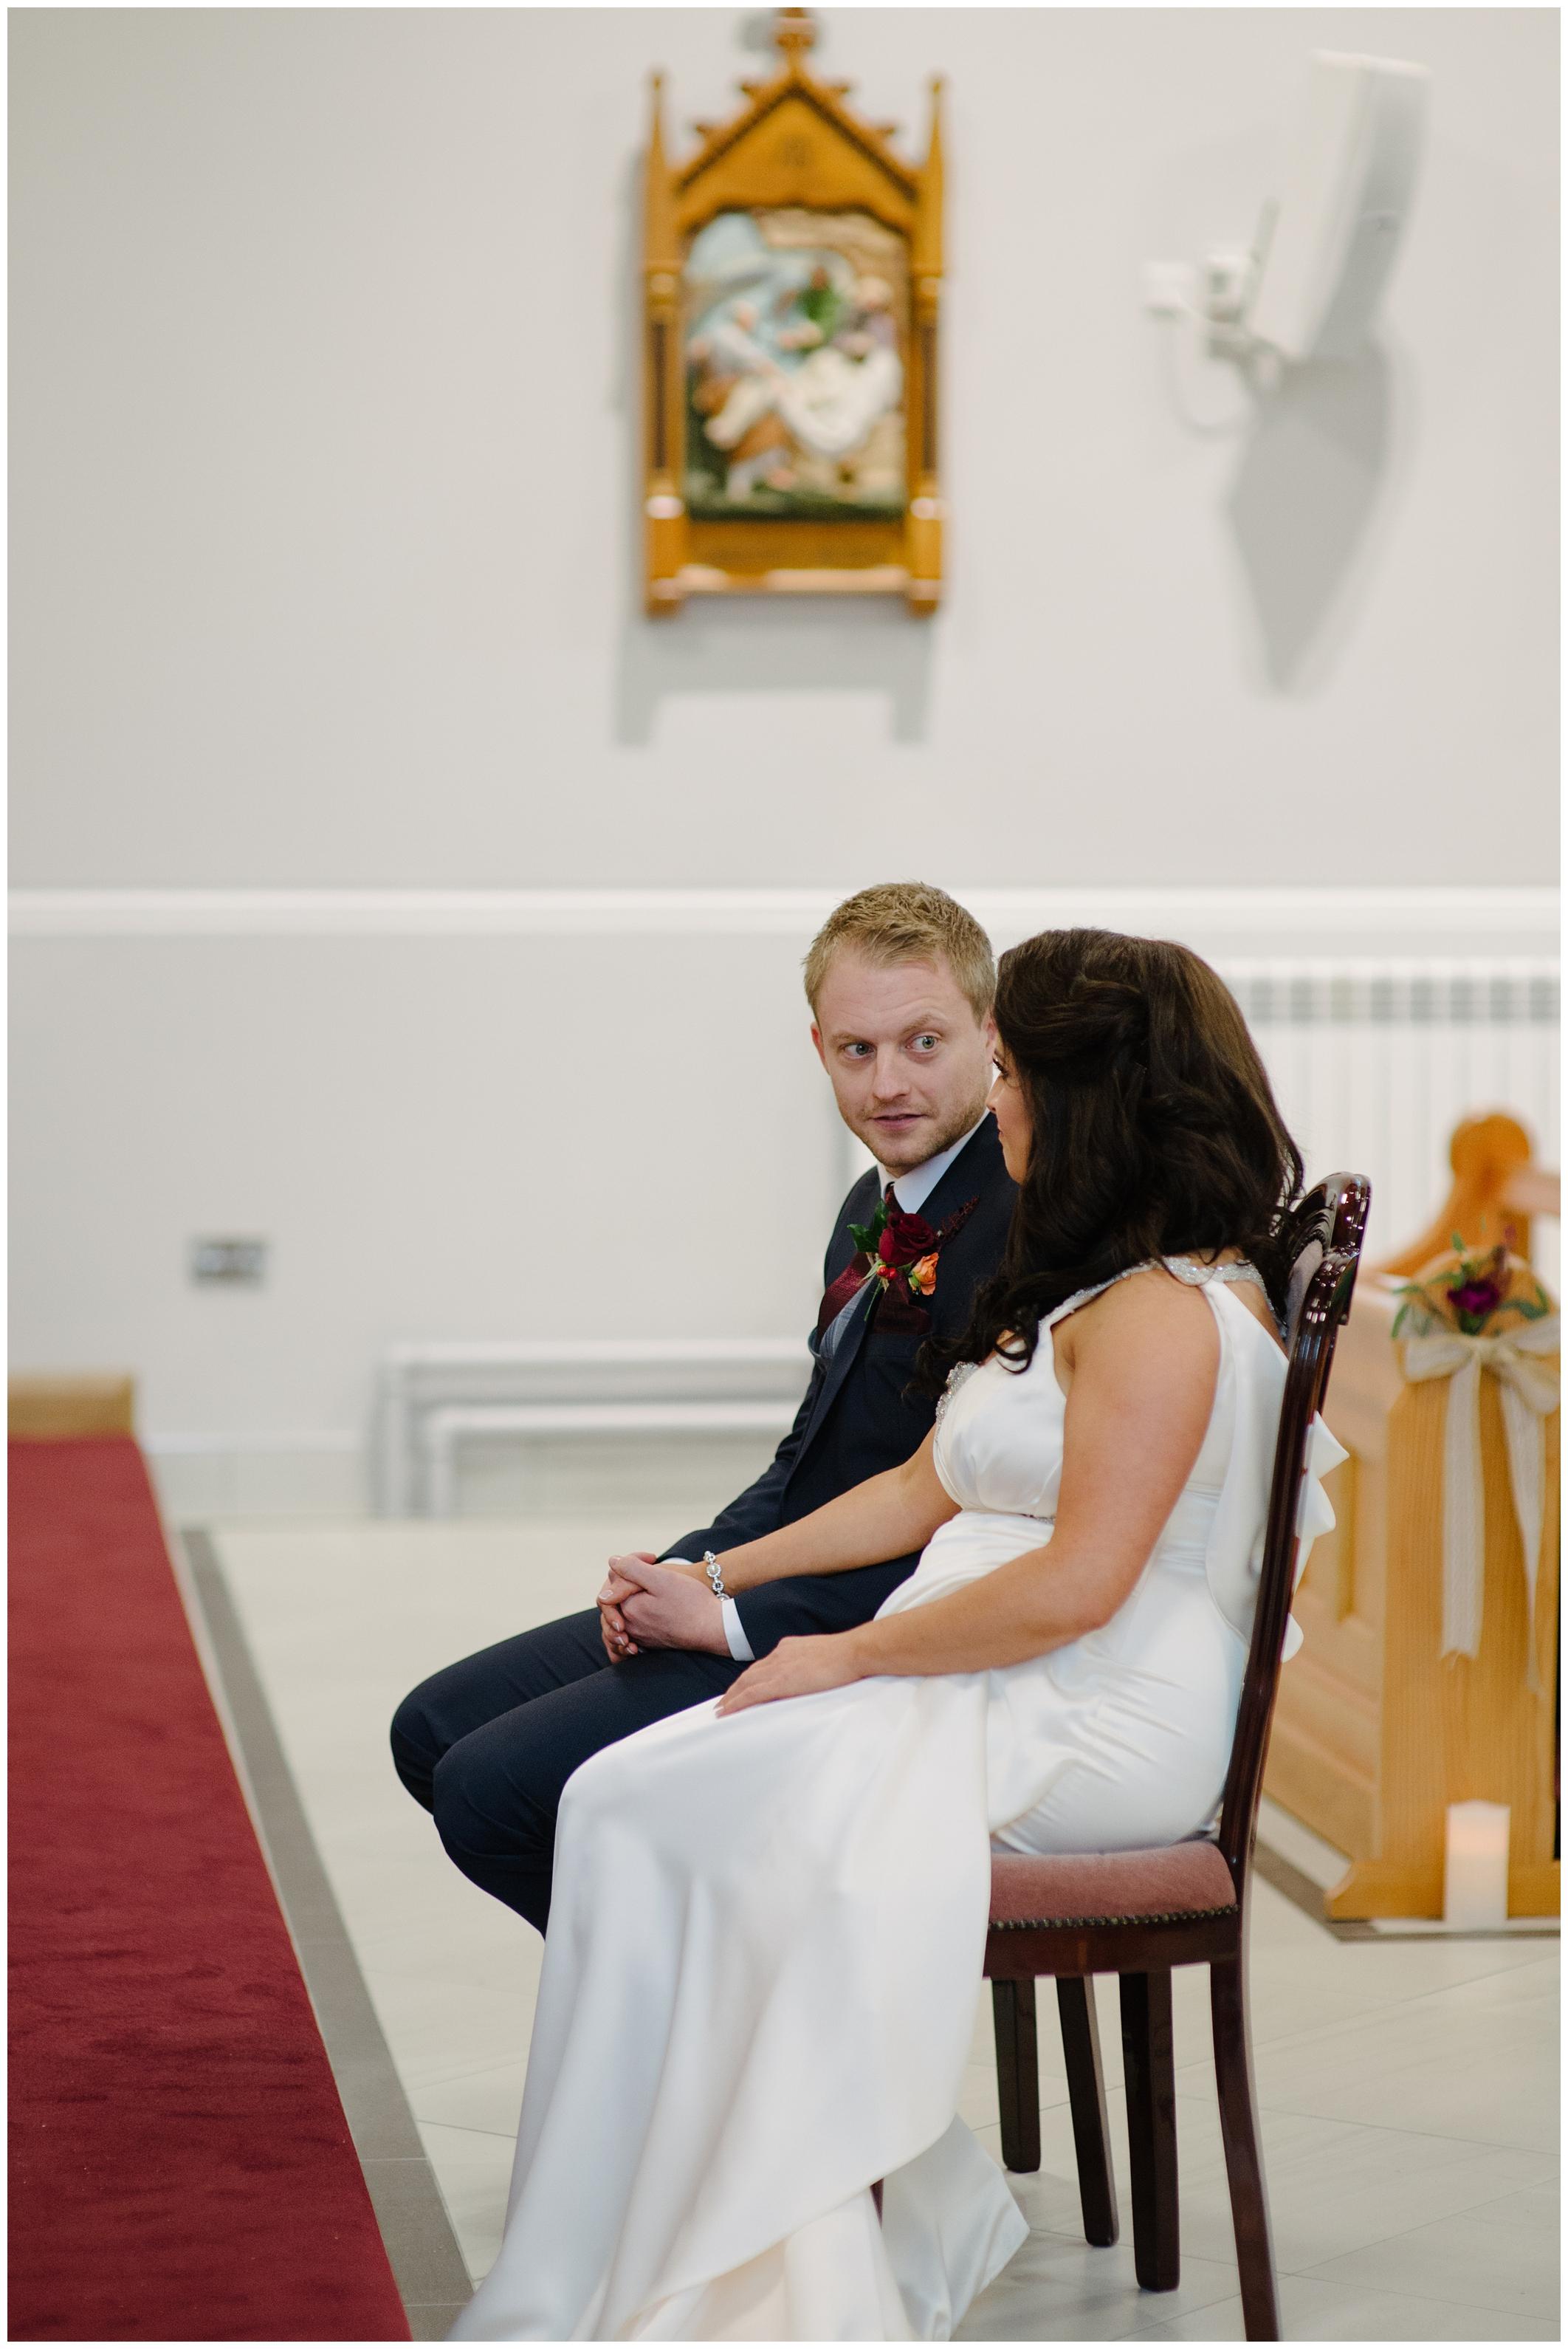 tracey_conor__wedding_jude_browne_photography_0027.jpg